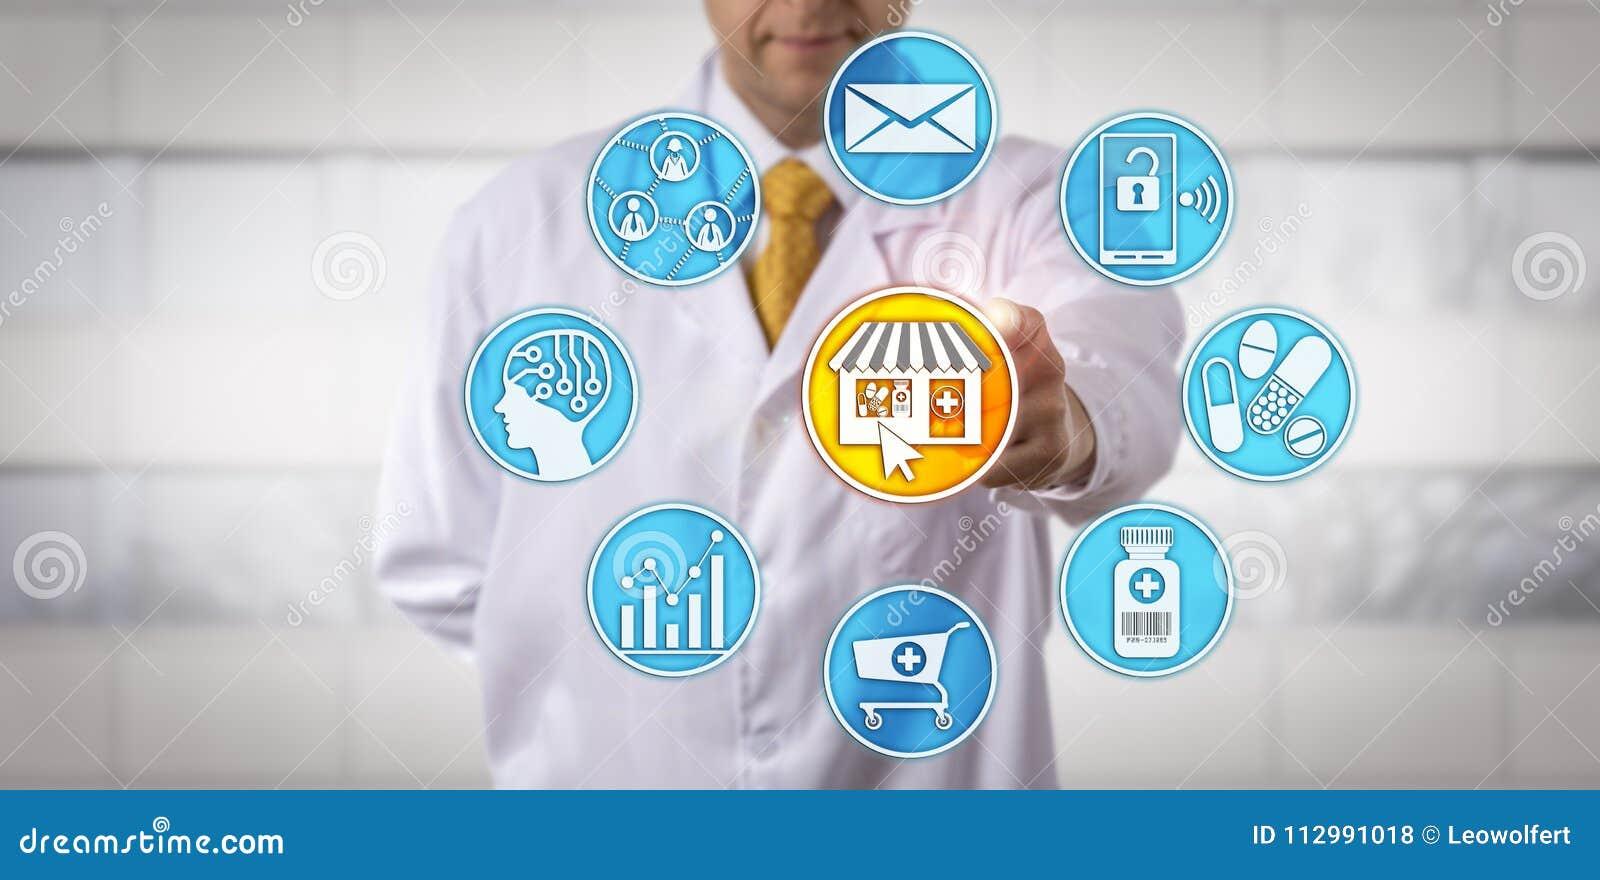 Independent Retail Pharmacist Starting E-Pharmacy